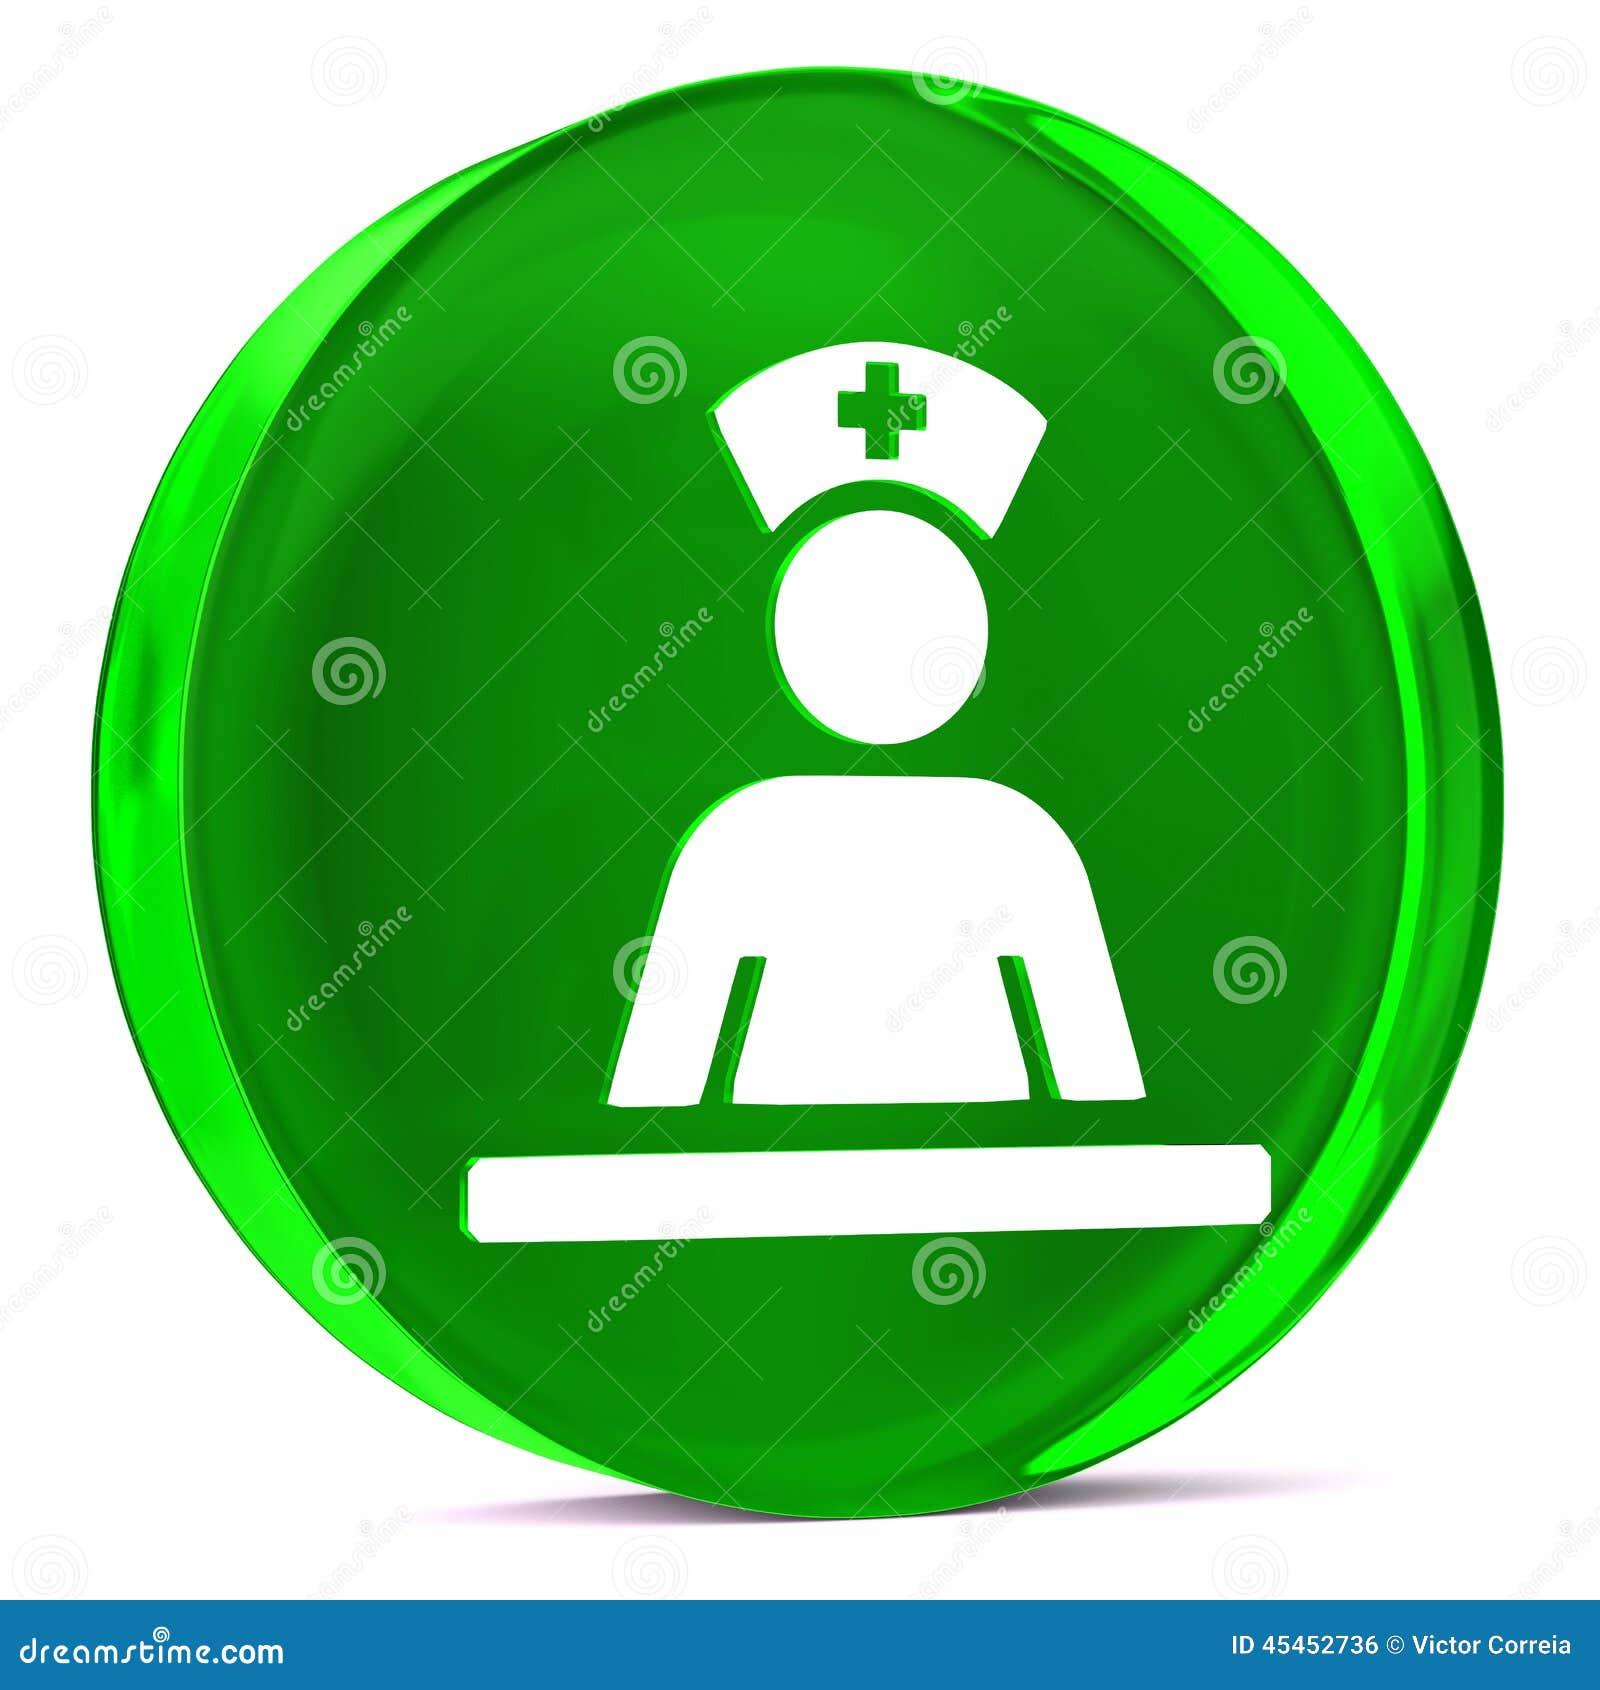 Medical Staff Area Stock Photo Image Of Staff Symbol 45452736